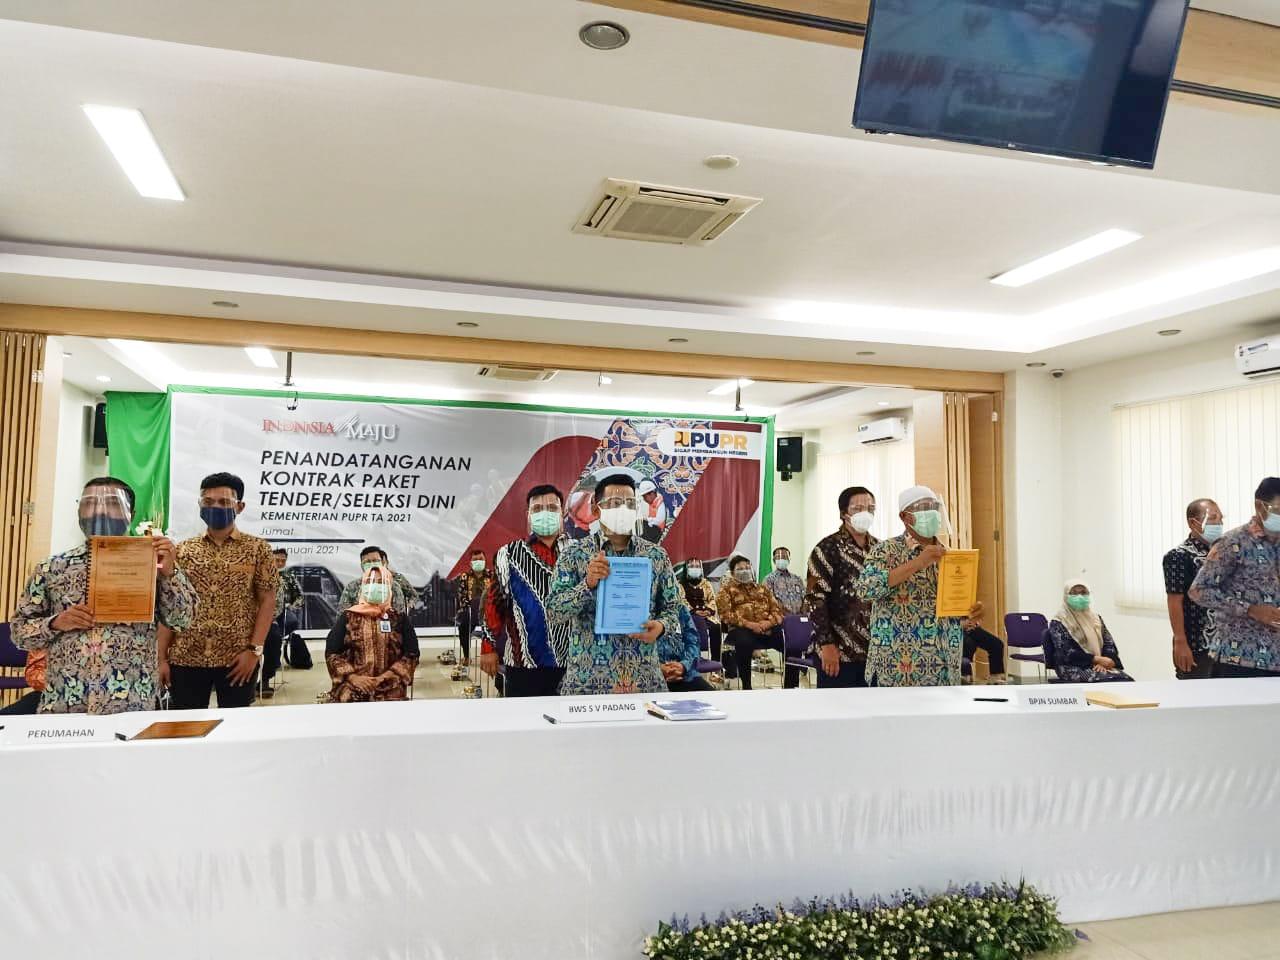 Penandatanganan Kontrak Serentak di Kementerian PUPR. Jokowi : Aura dan Semangat kedepannya harus Extraordinary